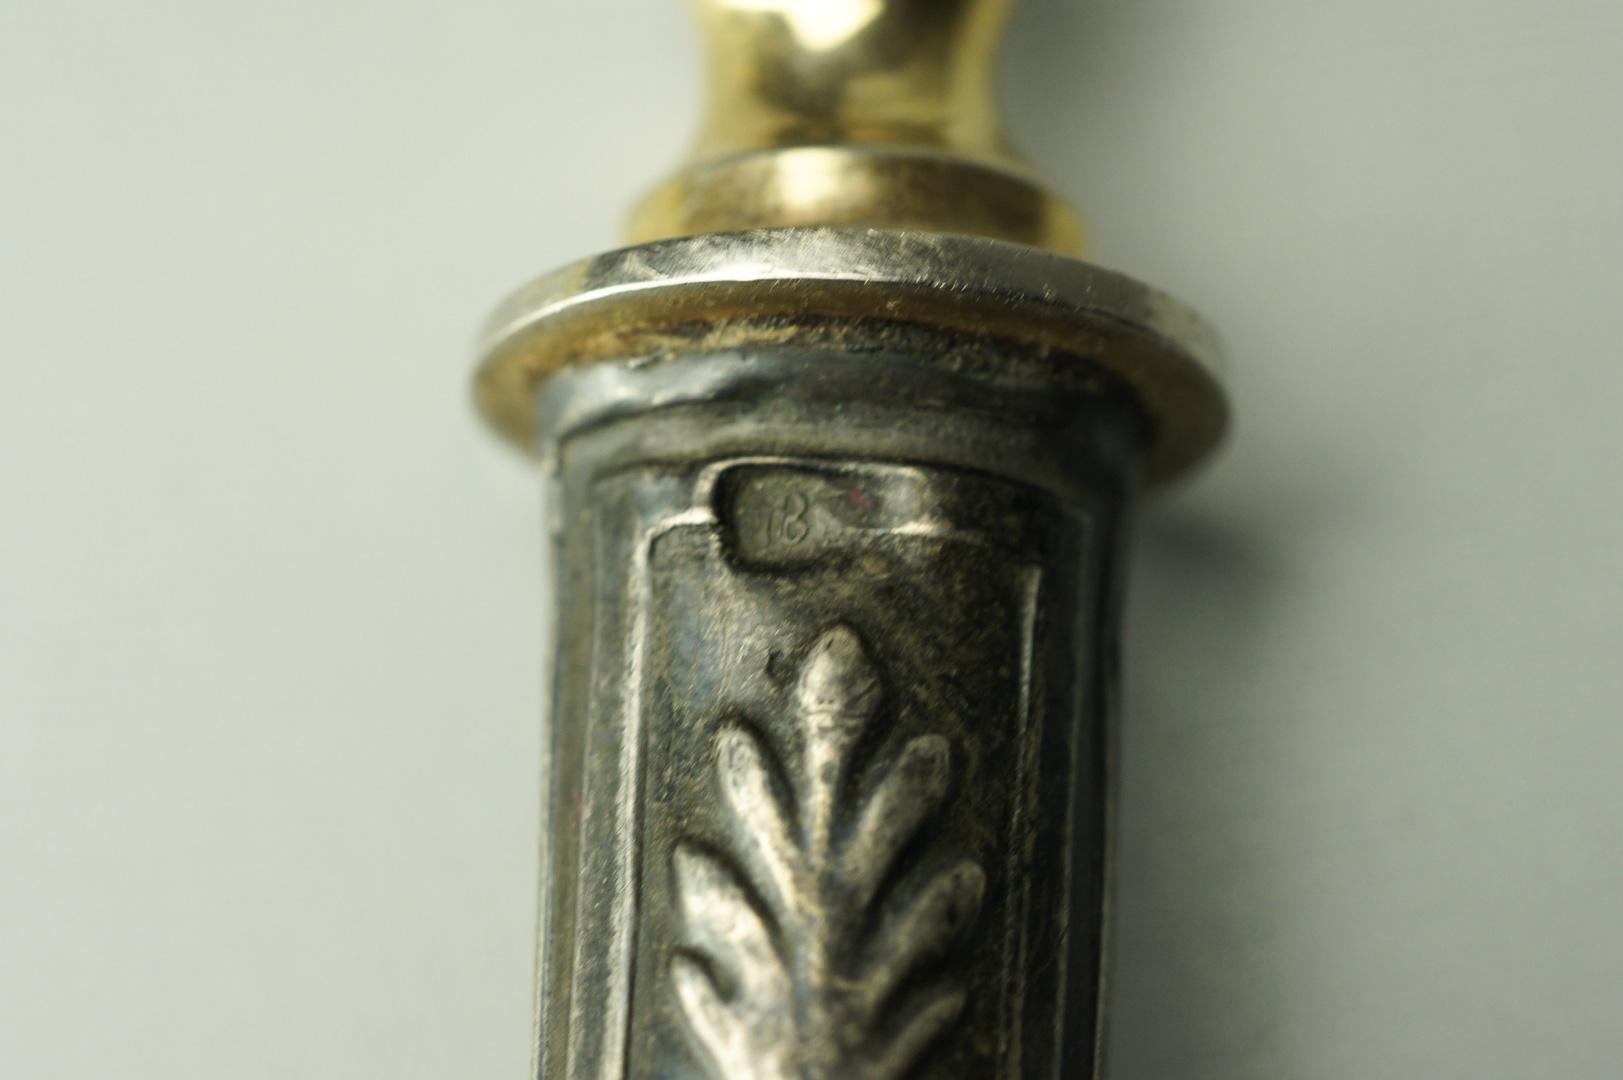 Лопатка для торта серебро